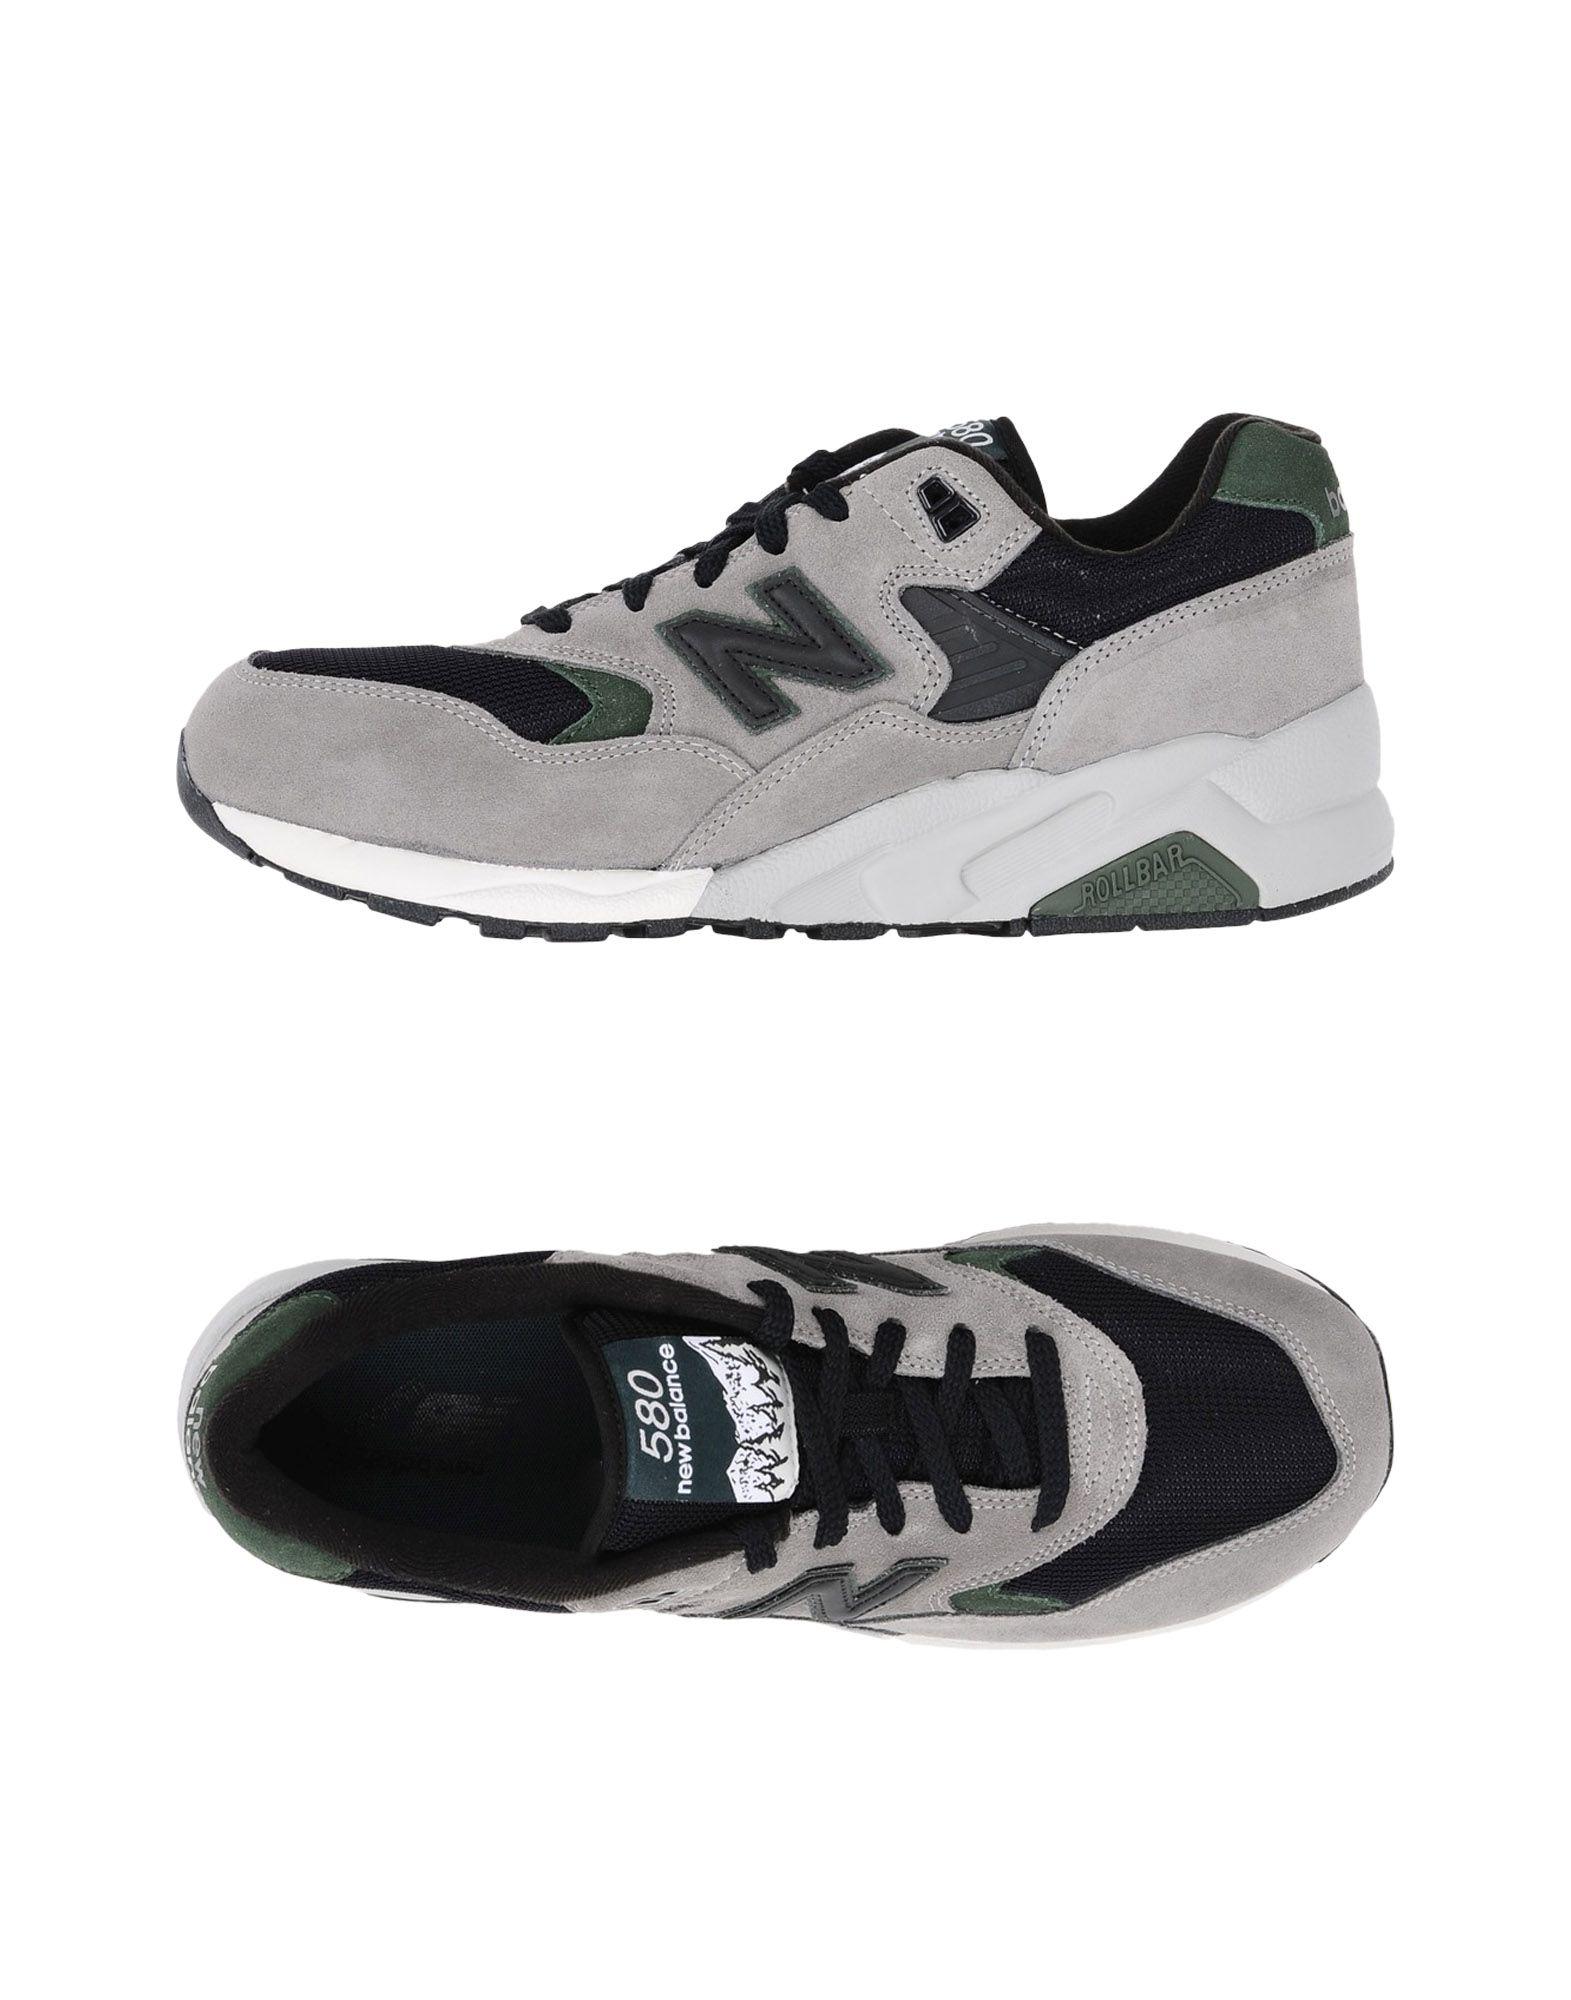 Sneakers New Balance 580 Winter - Uomo - Acquista online su